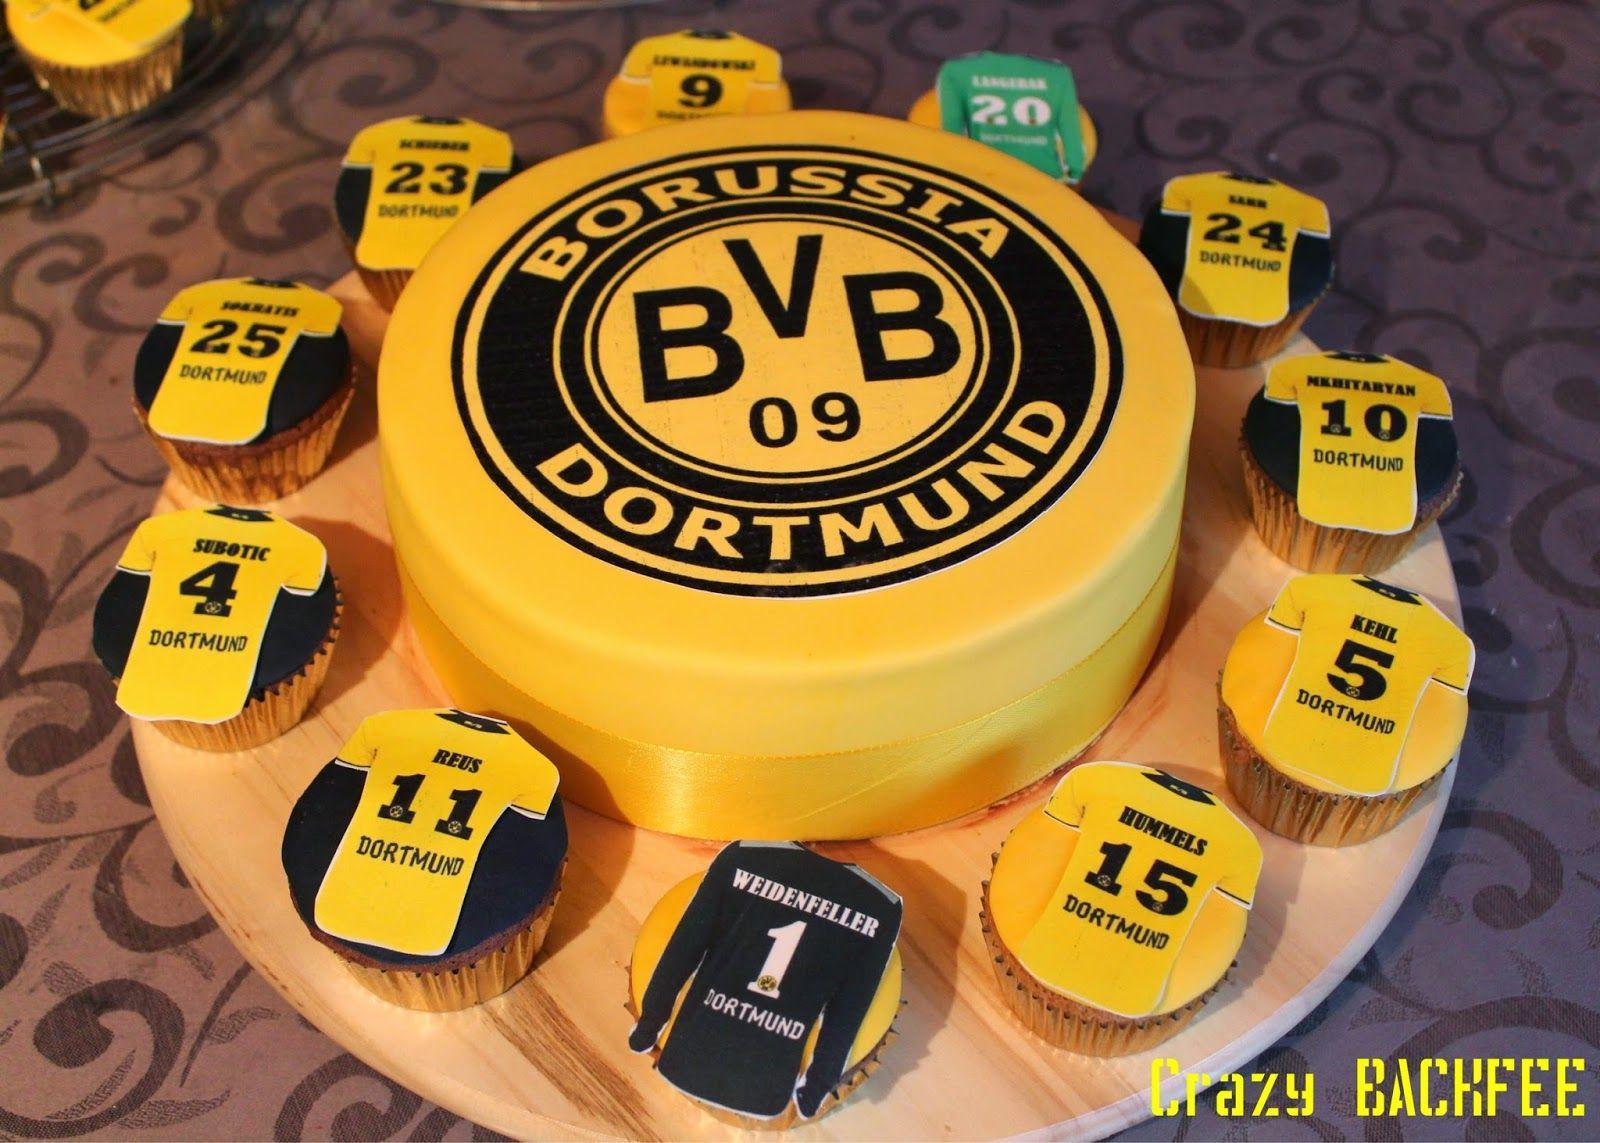 Crazy BackNo BVB Torte und Cupcakes  torten  Bvb torte